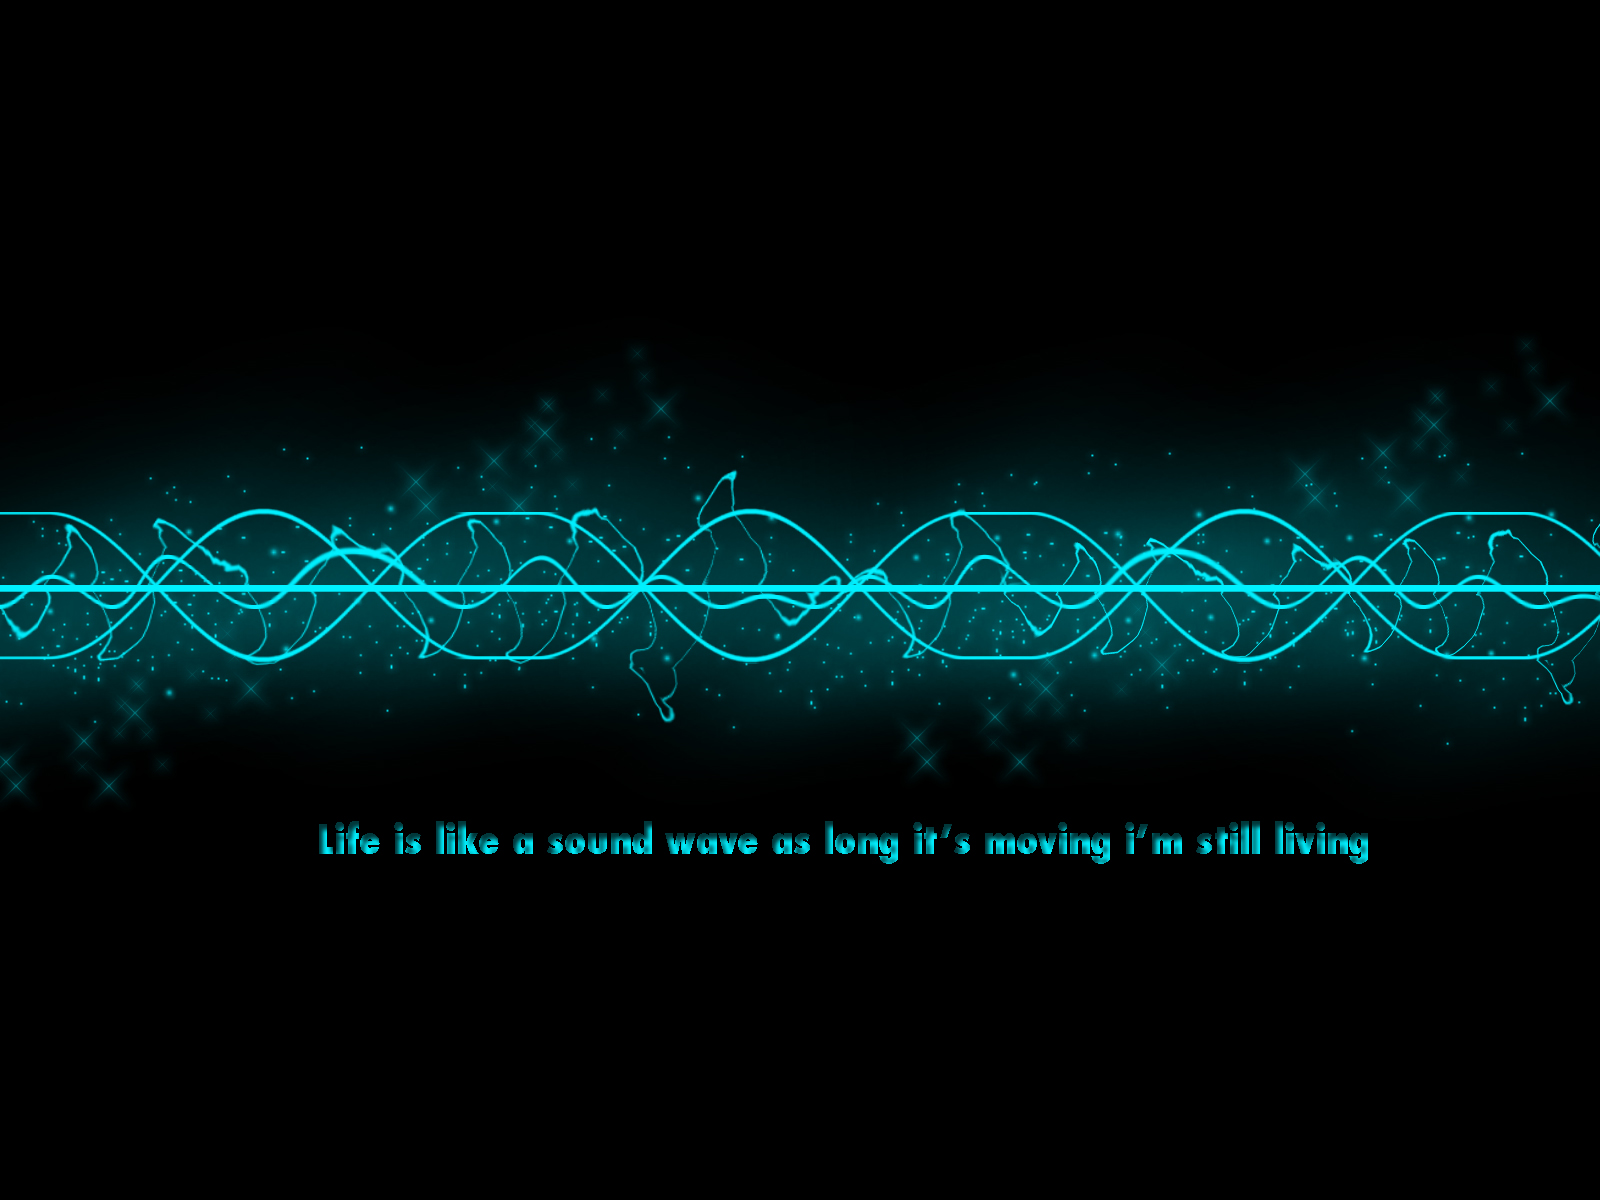 Sound wave is like life by Mar1na8 1600x1200